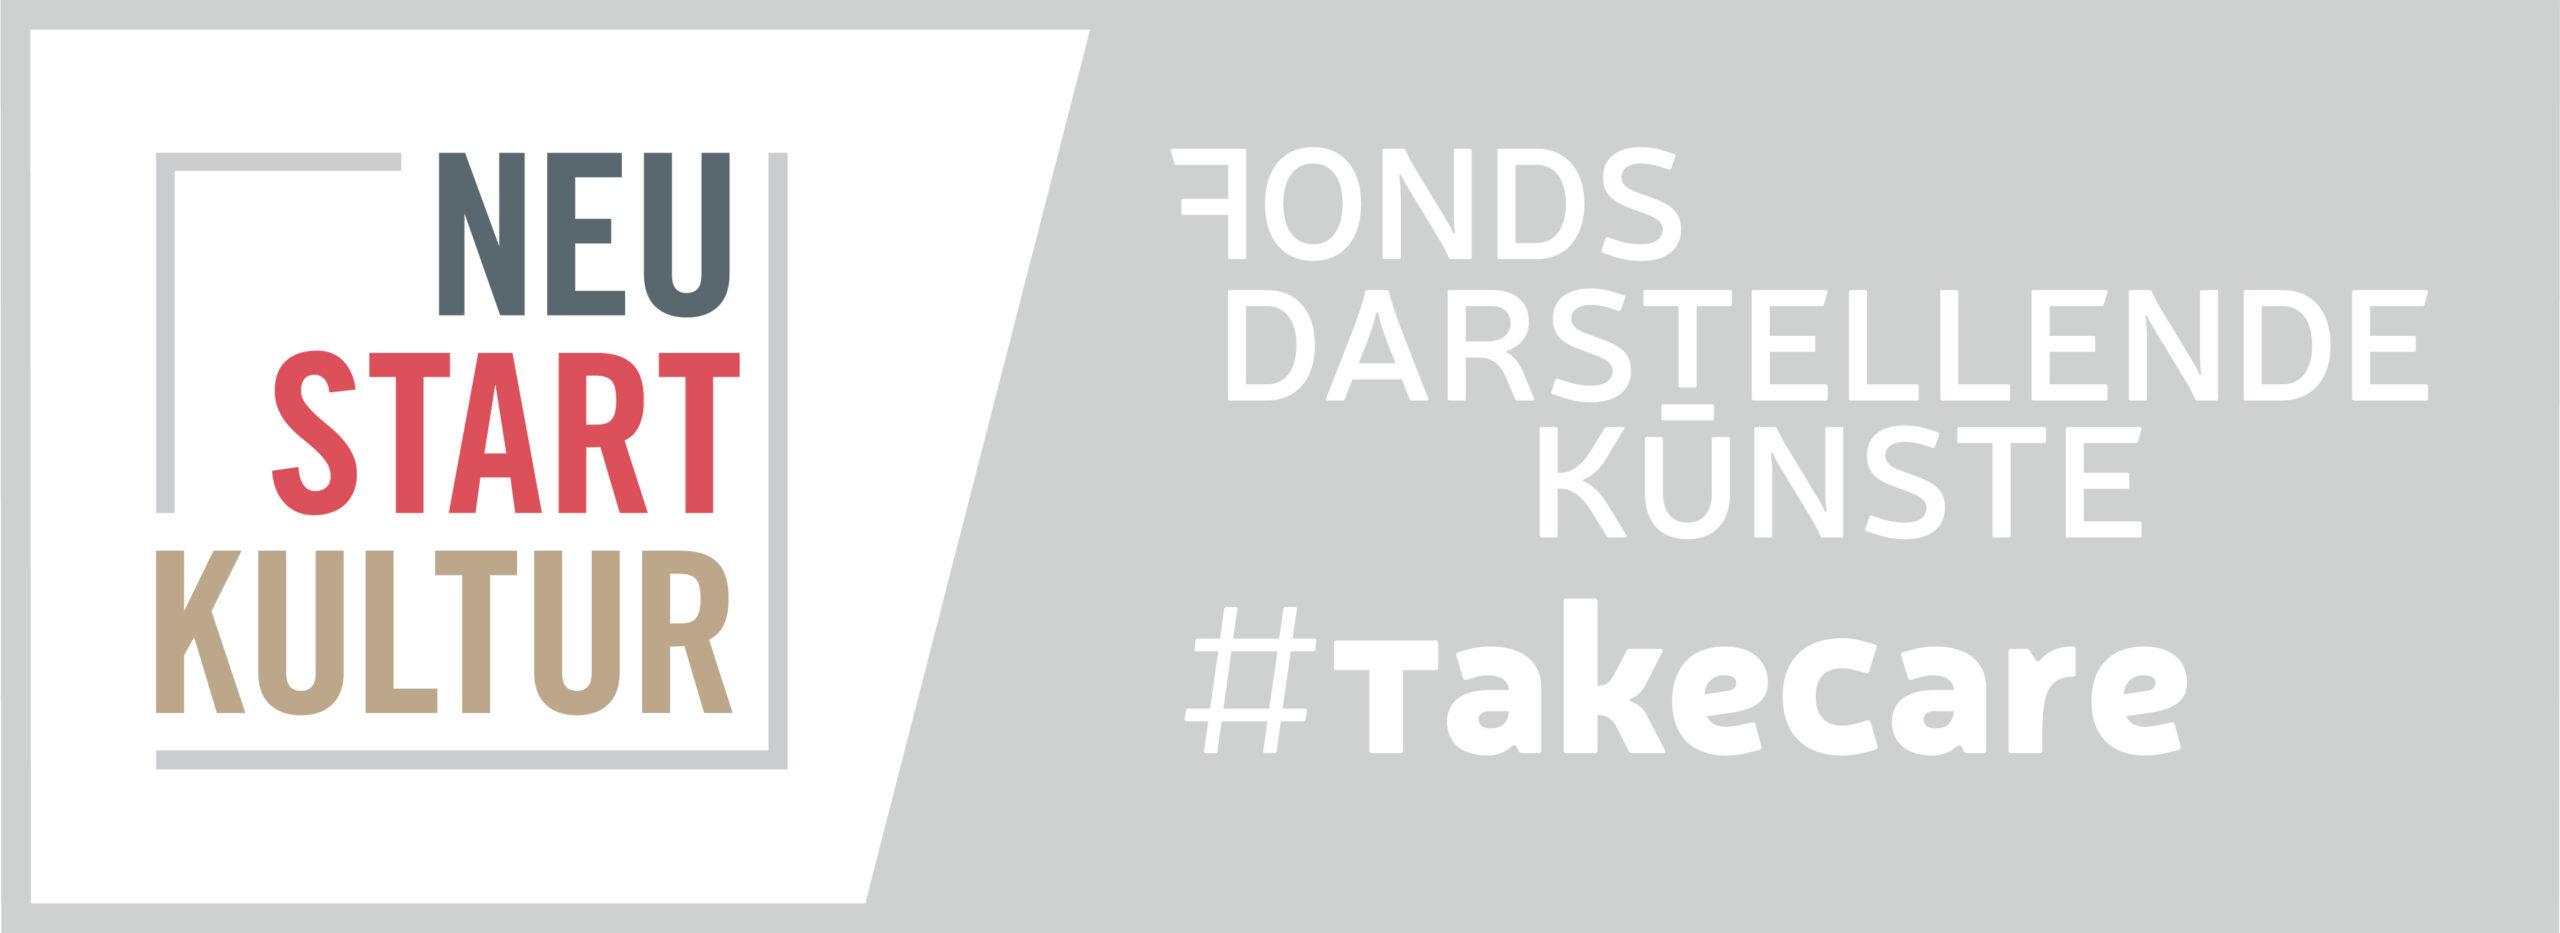 #TakeThatNeustart